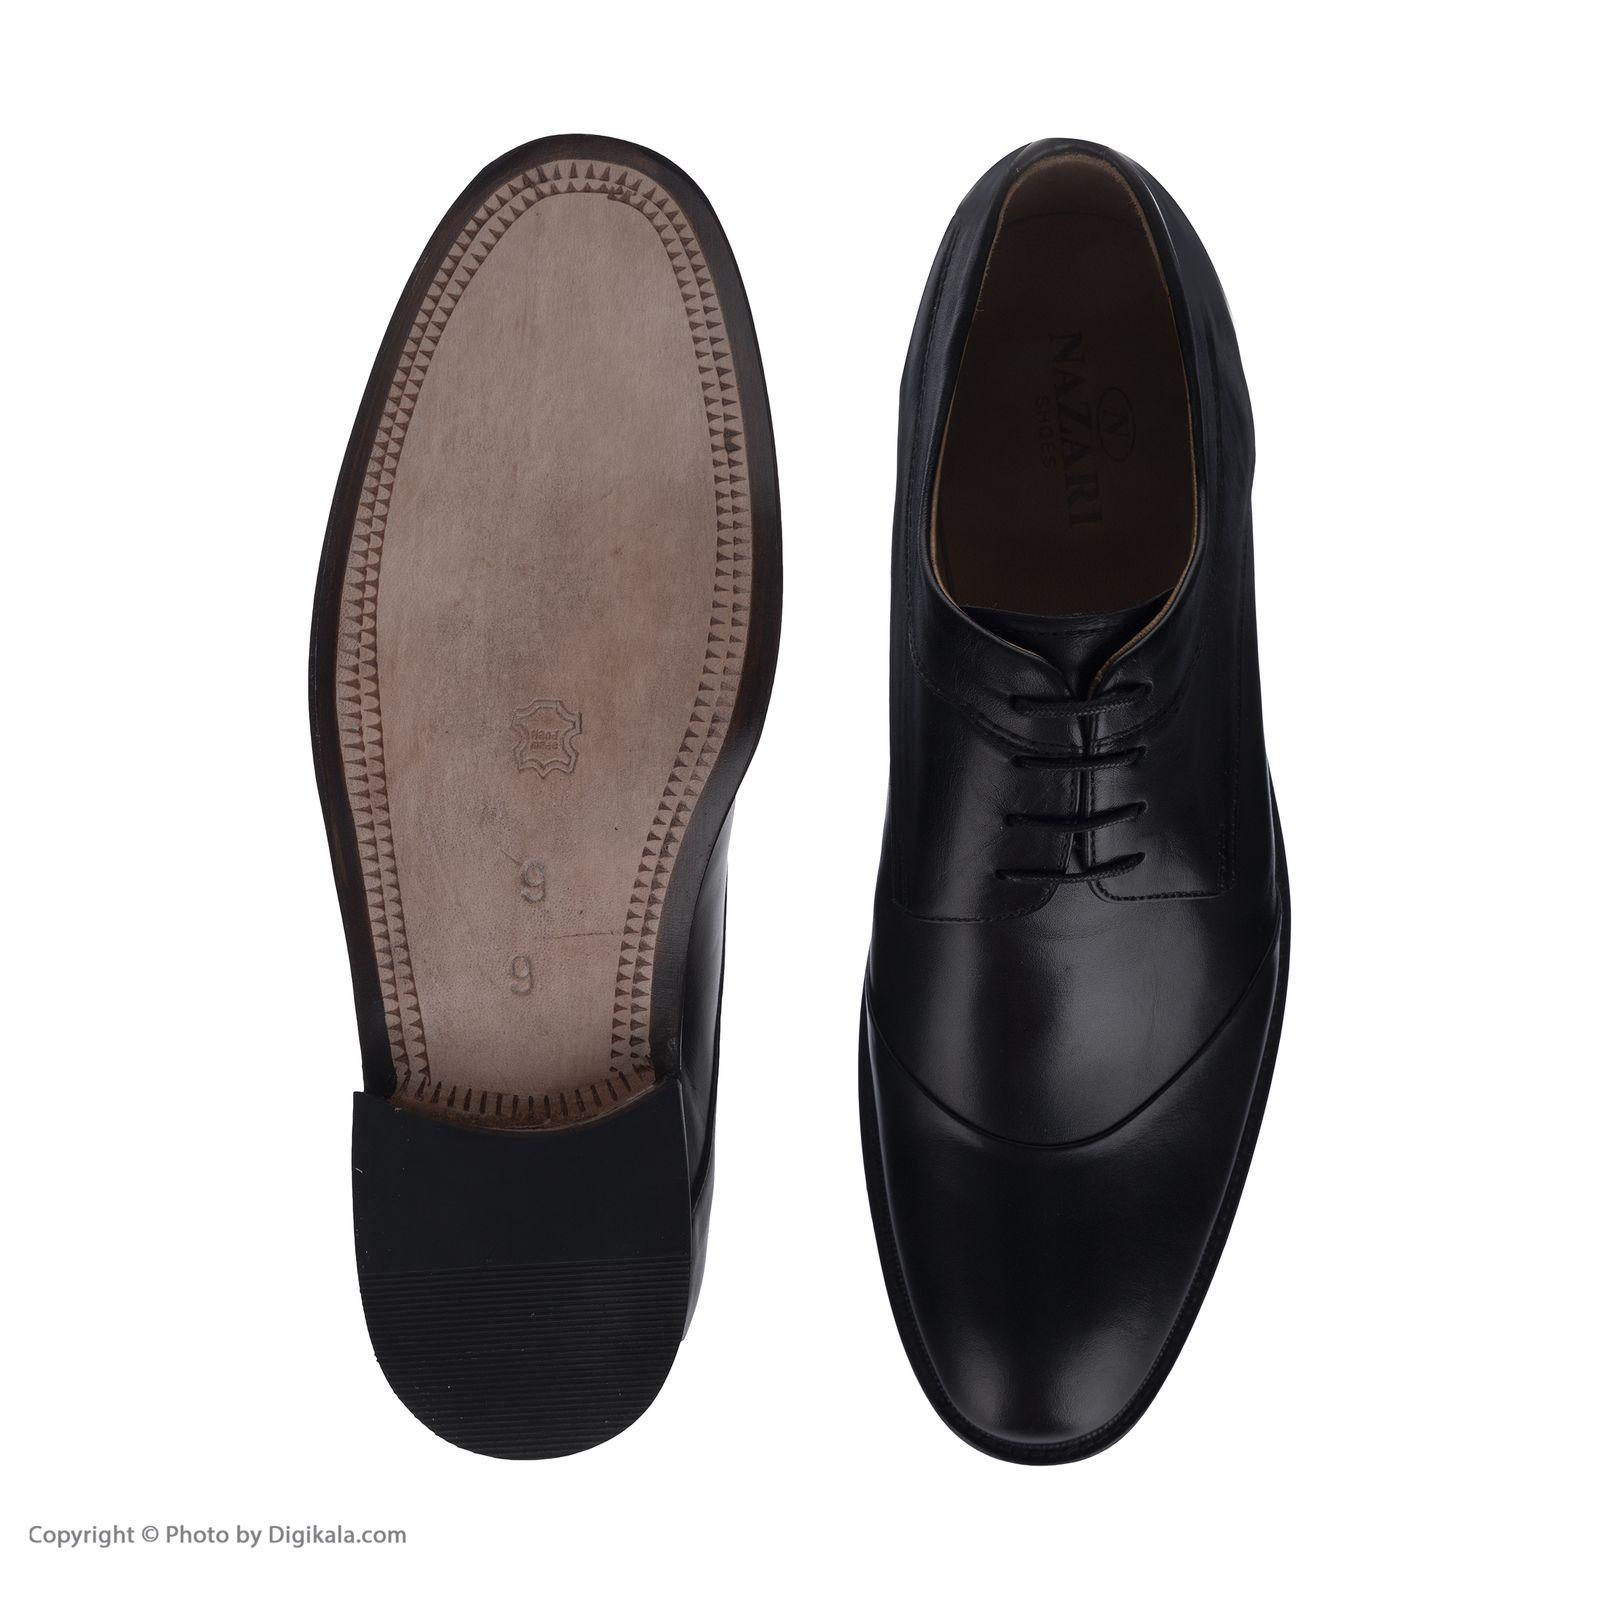 کفش مردانه نظری کد 423 -  - 3